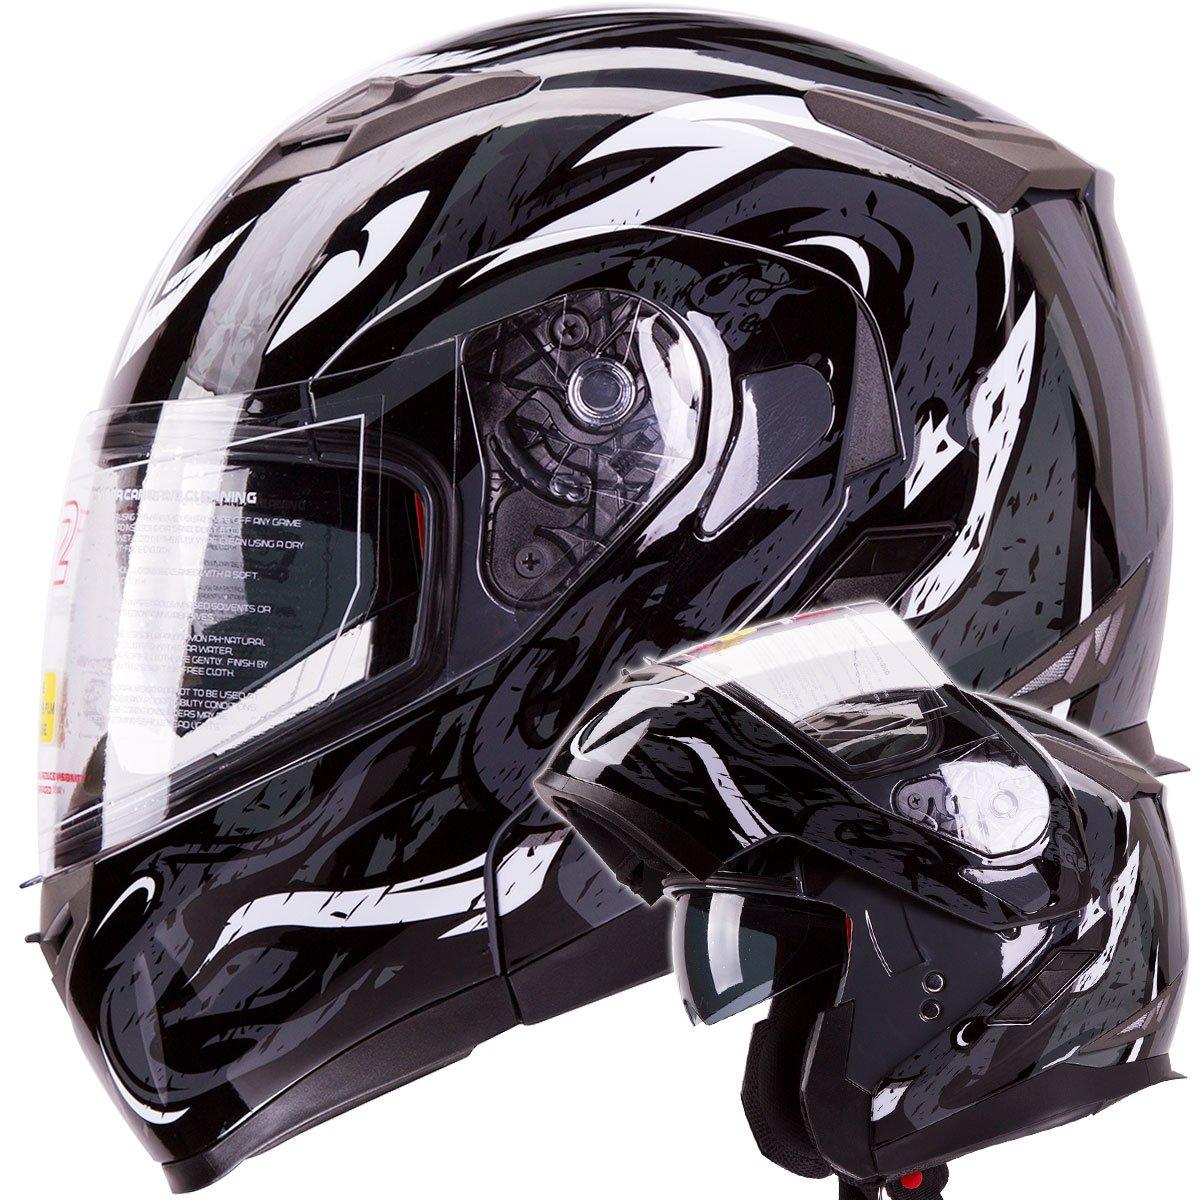 VIPER Modular Dual Visor Motorcycle / Snowmobile Helmet DOT Approved